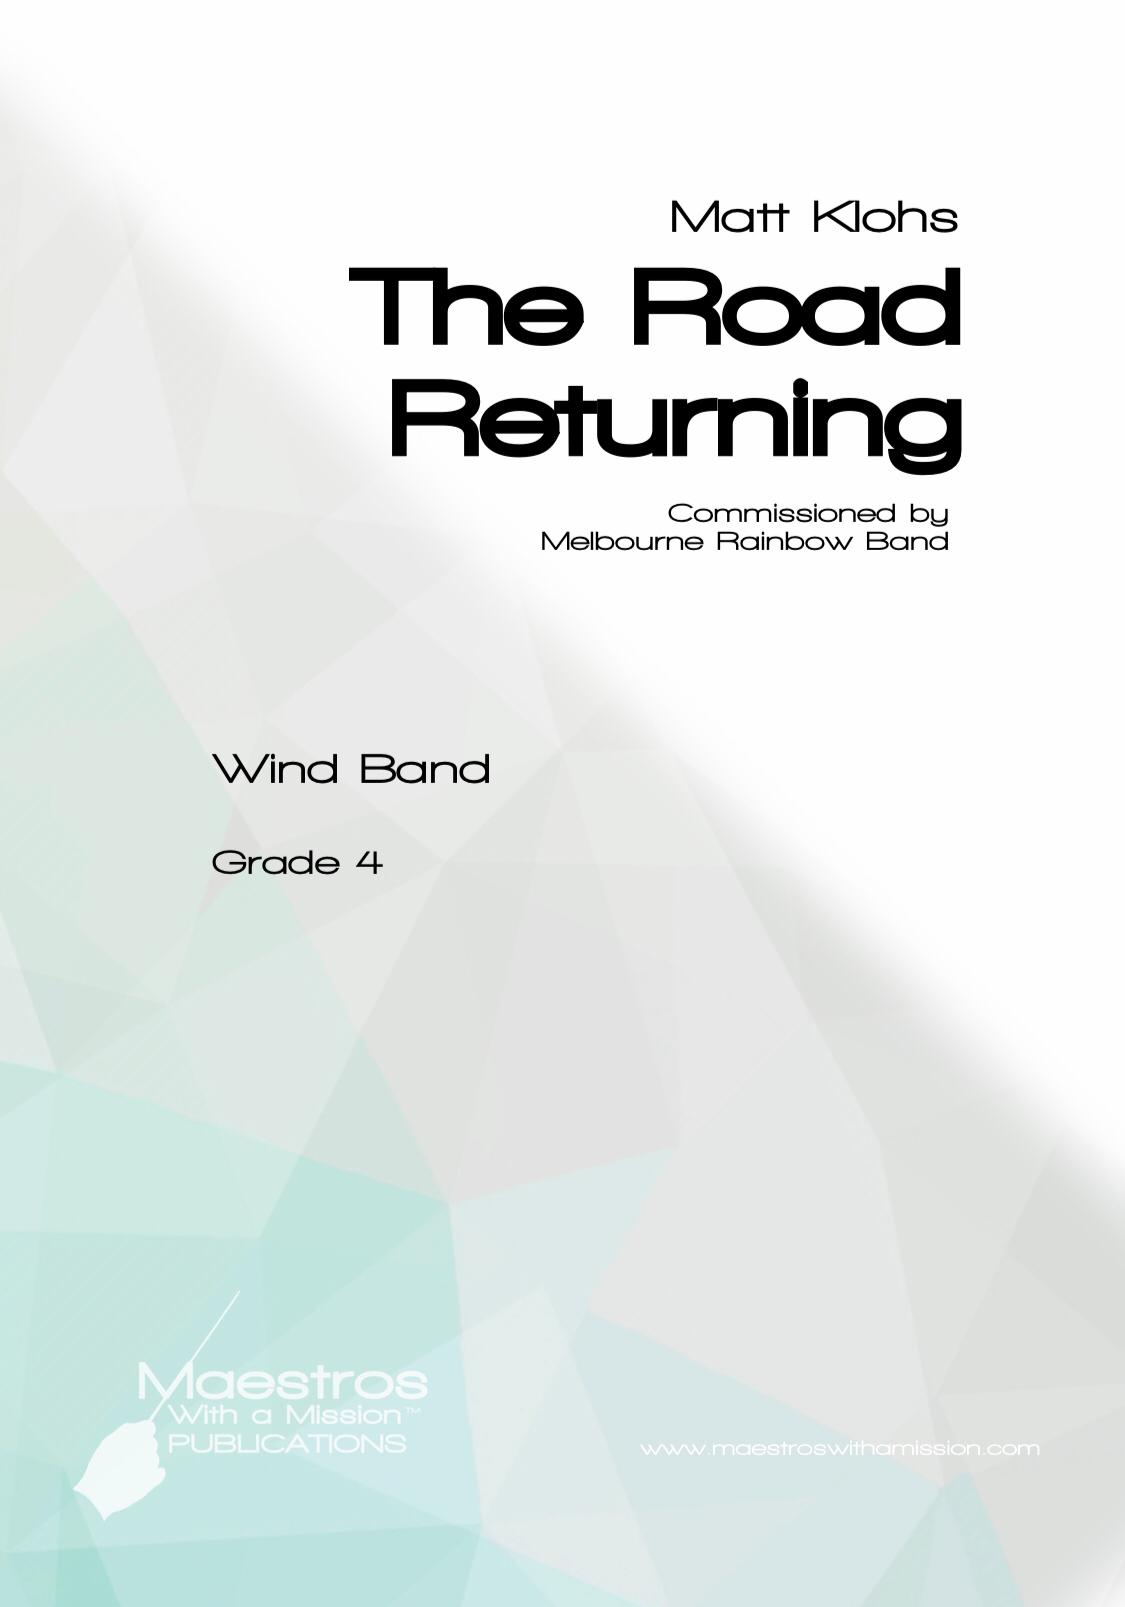 The Road Returning by Matt Klohs